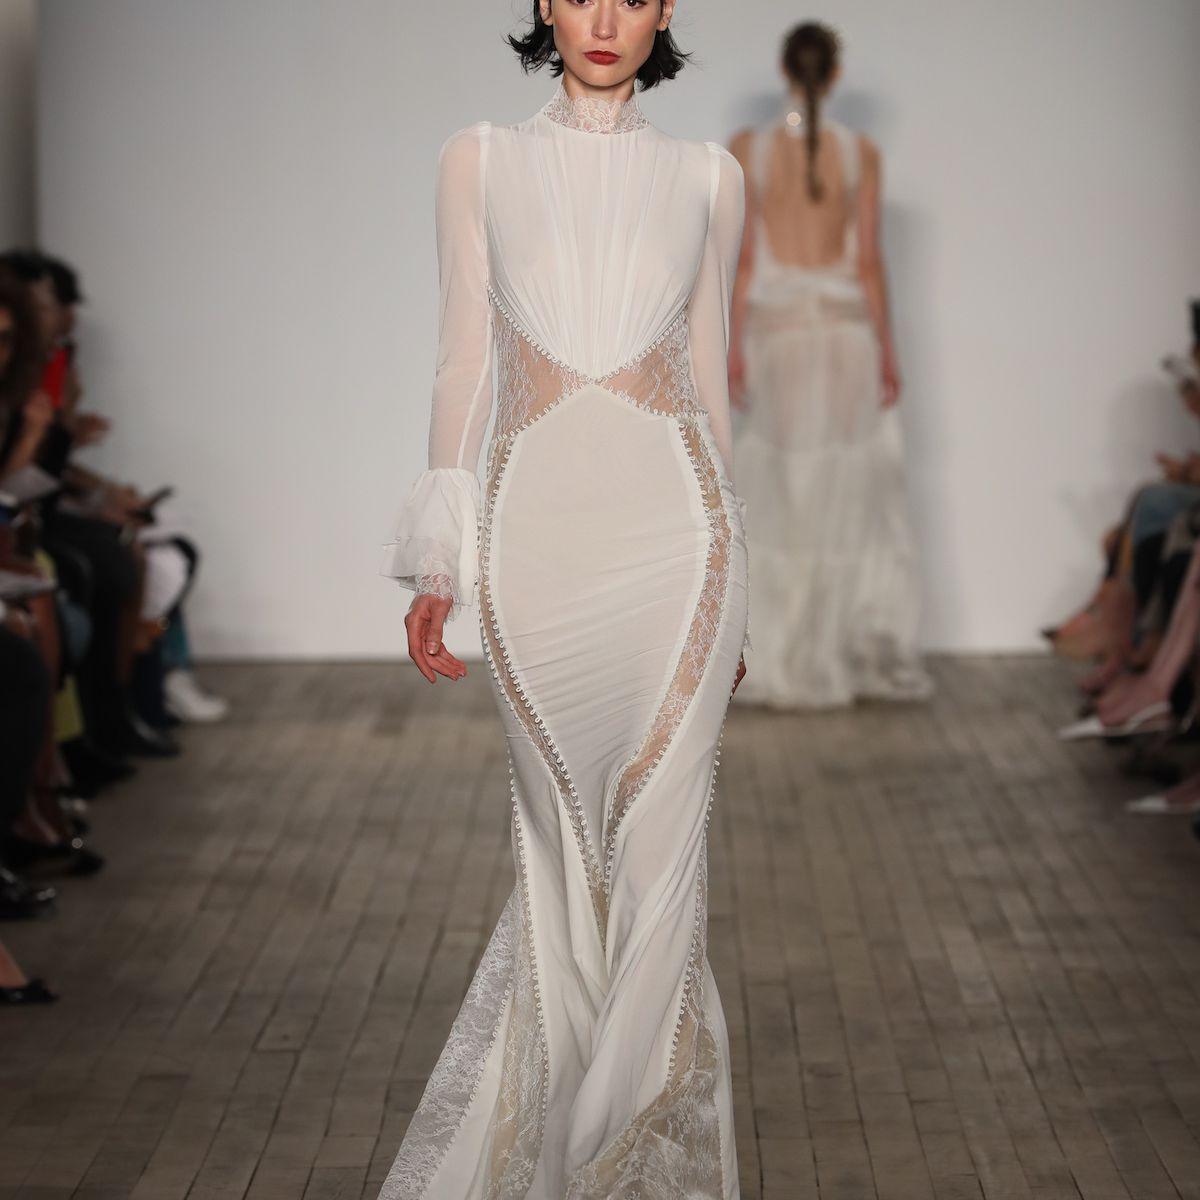 Model in long sleeve sheer panel wedding dress